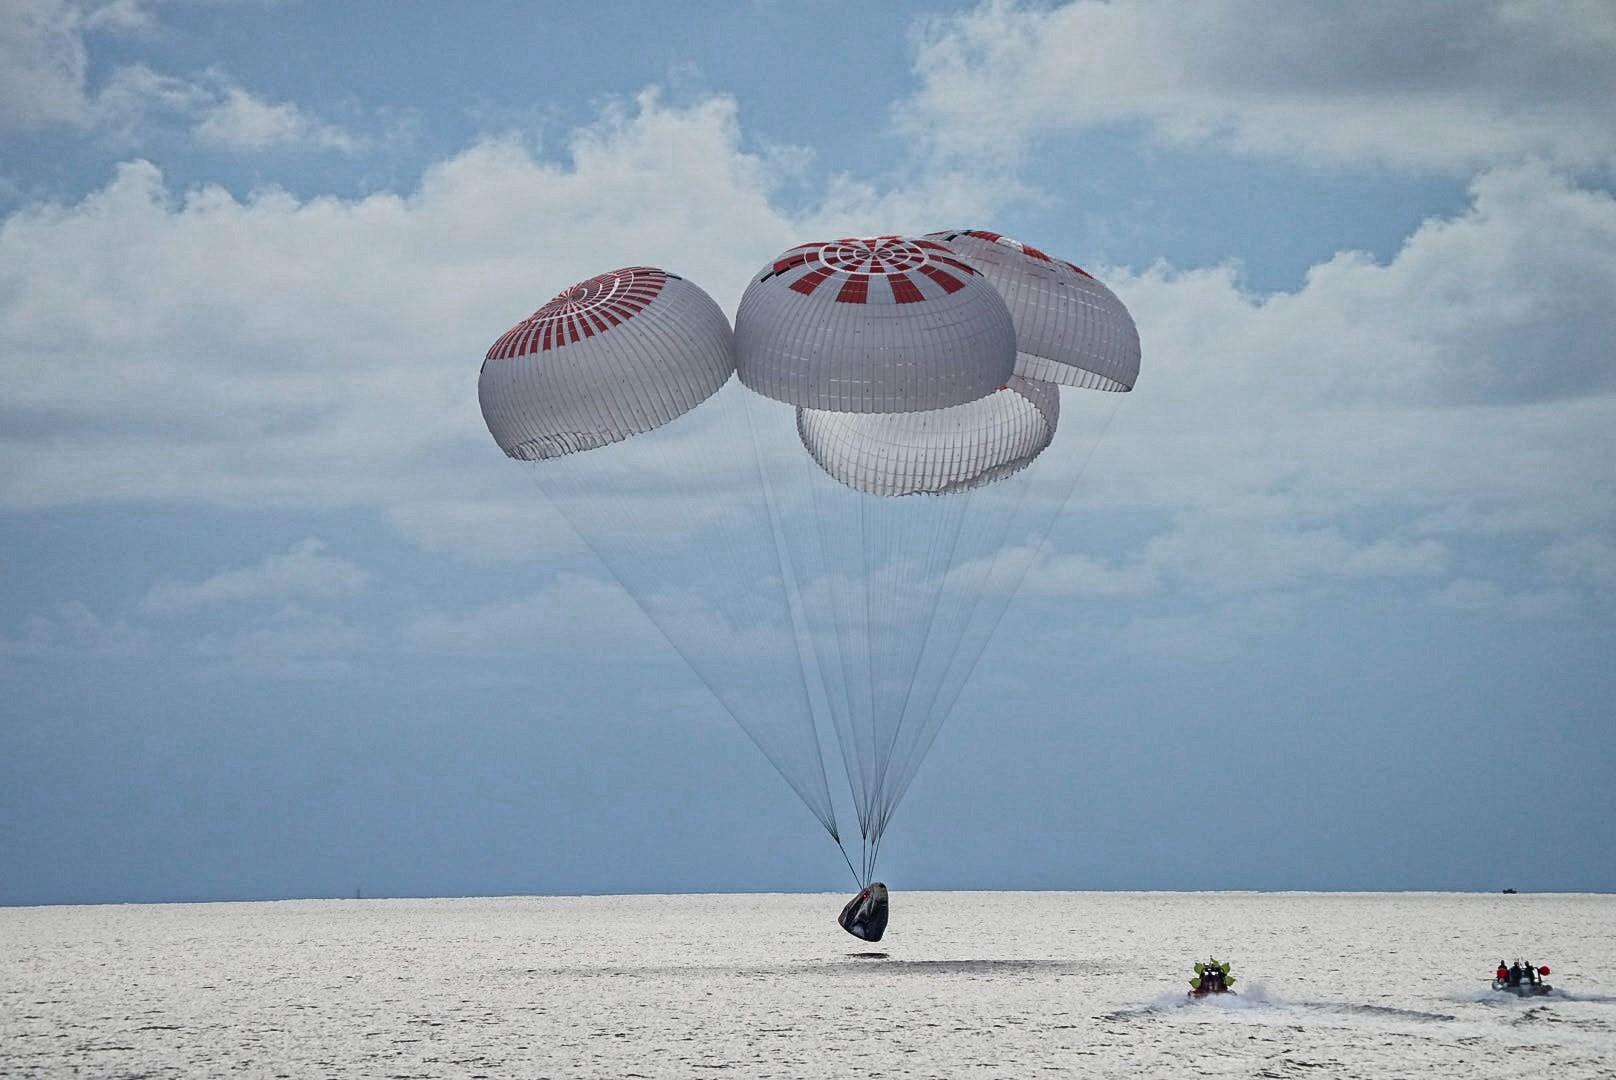 All-Civilian Inspiration4 Crew of 1st Time Space Travelers Splashdown Safely off Florida Coast in Atlantic Ocean